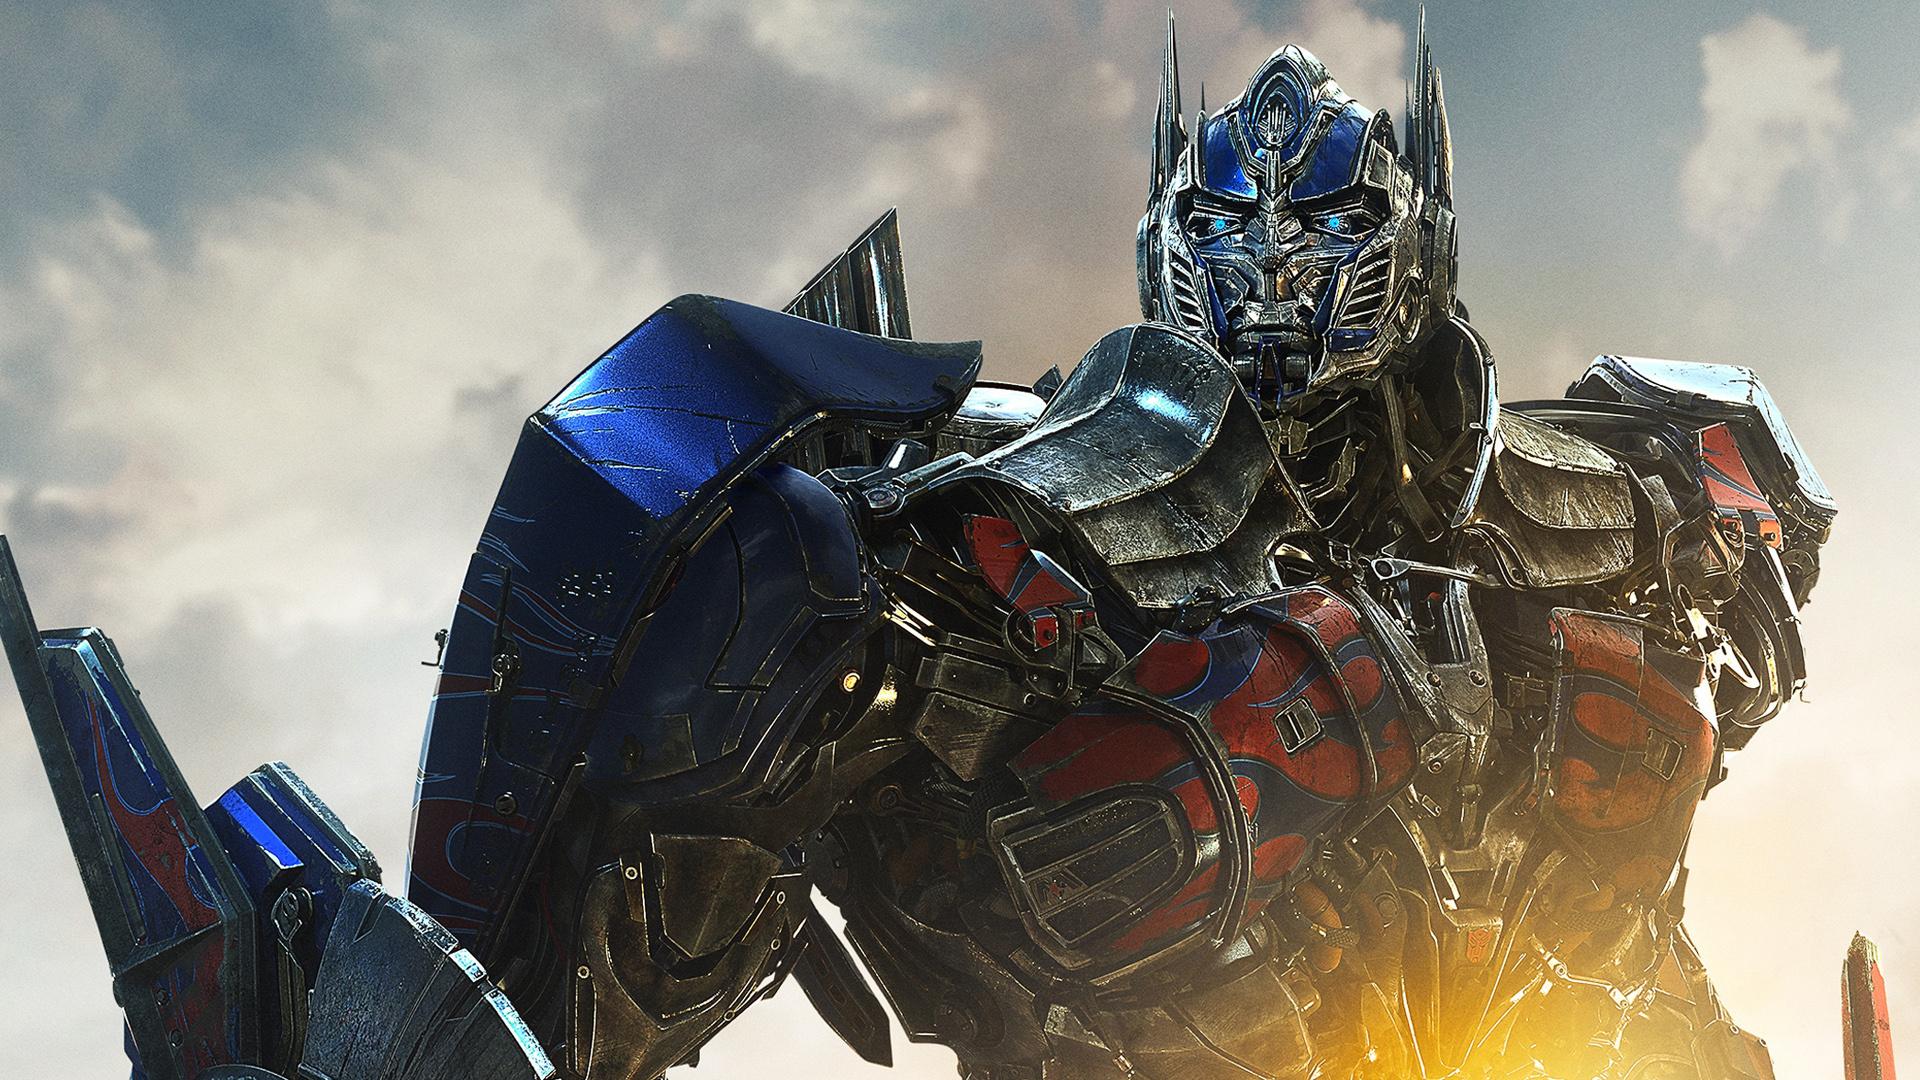 Transformers 4 aoe clip it's a big magnet 1080p